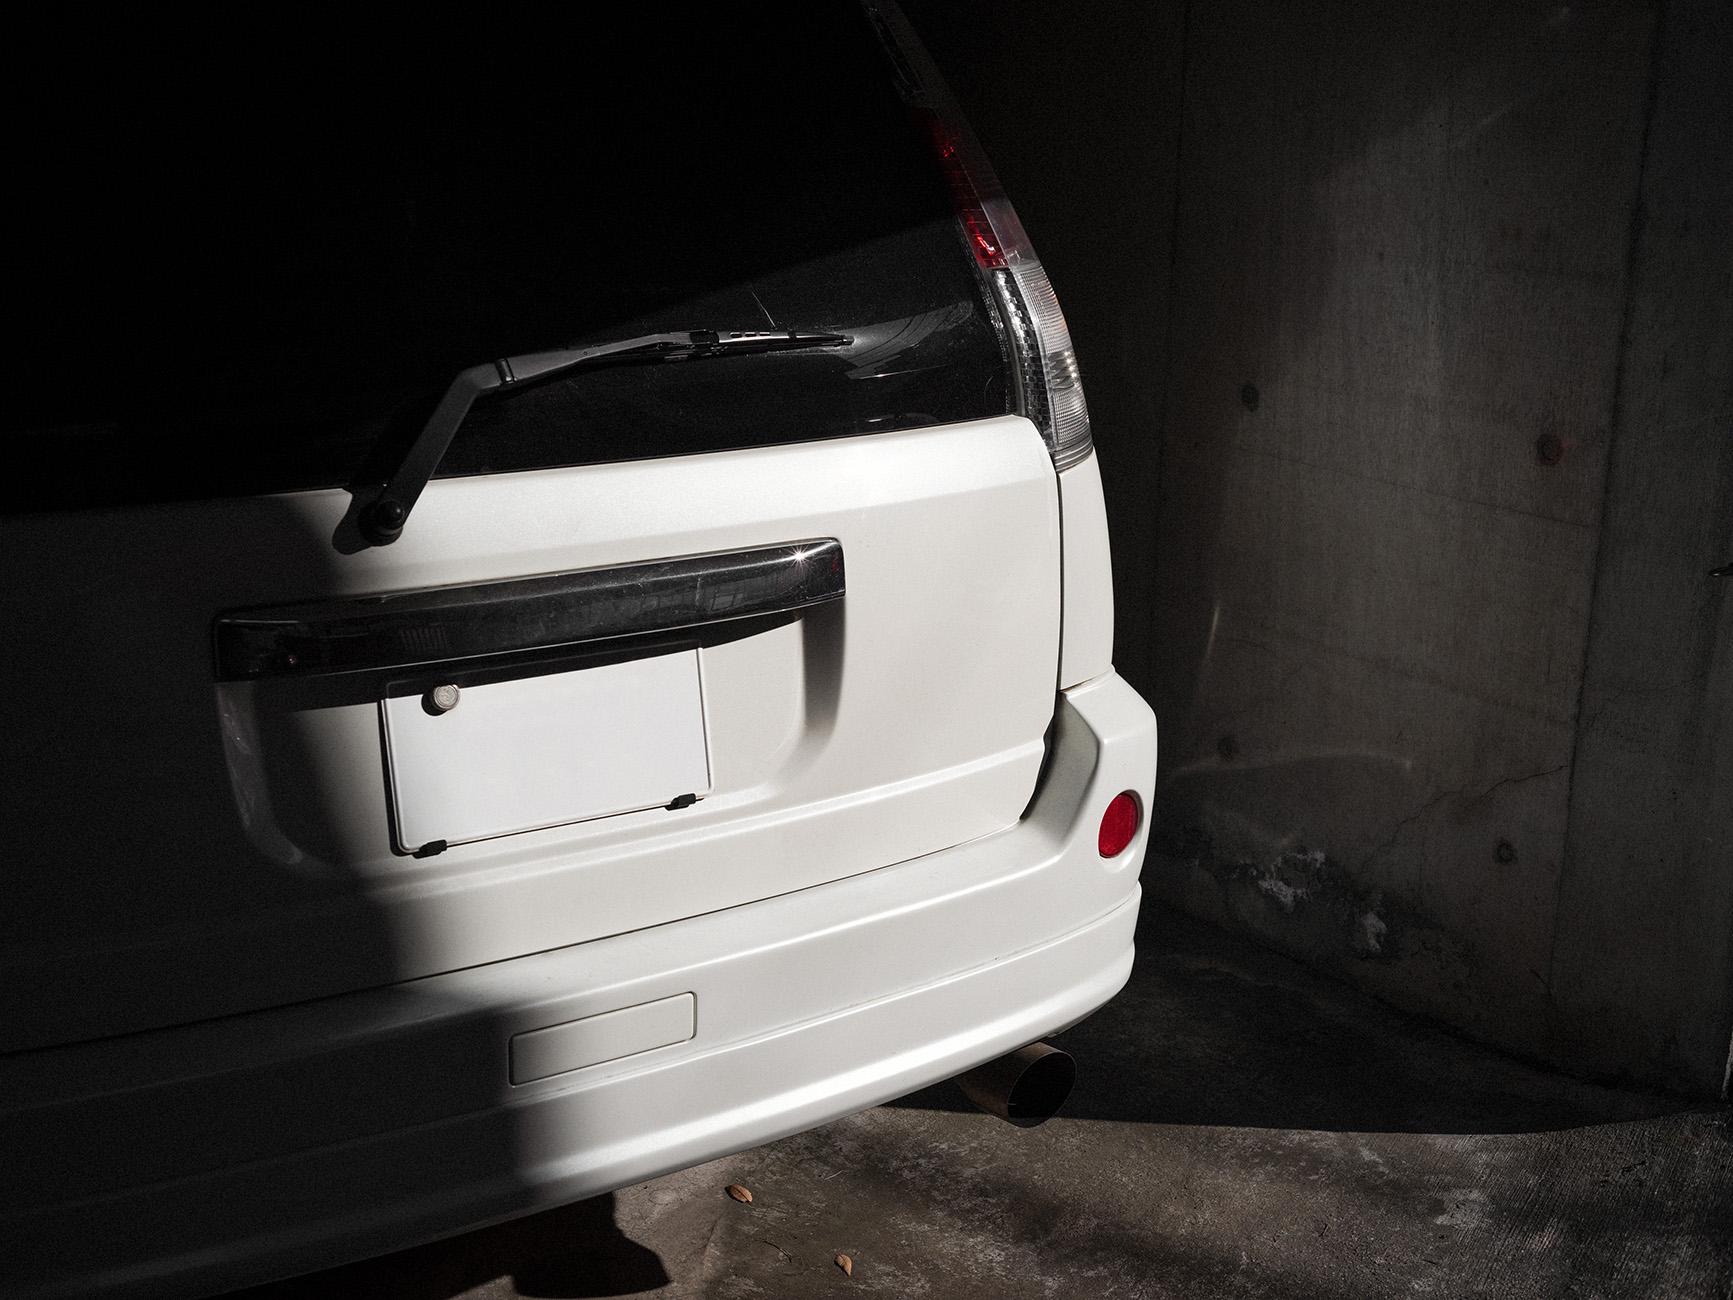 Nissan Bak copy.jpg